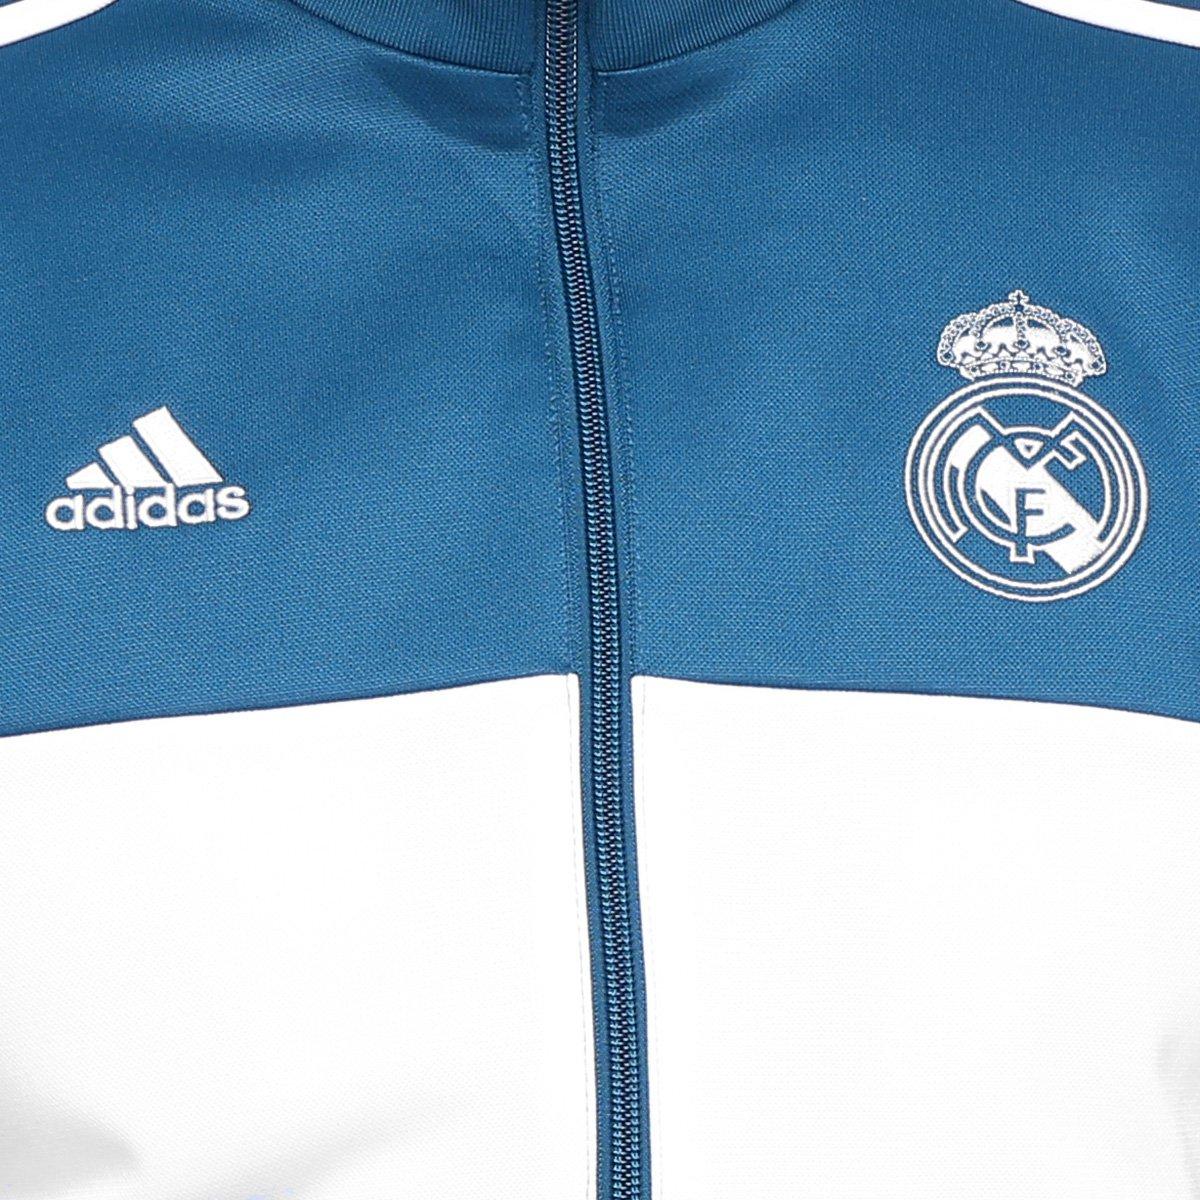 Jaqueta Real Madrid Adidas 3S Masculina - Compre Agora  e02b46670ac74